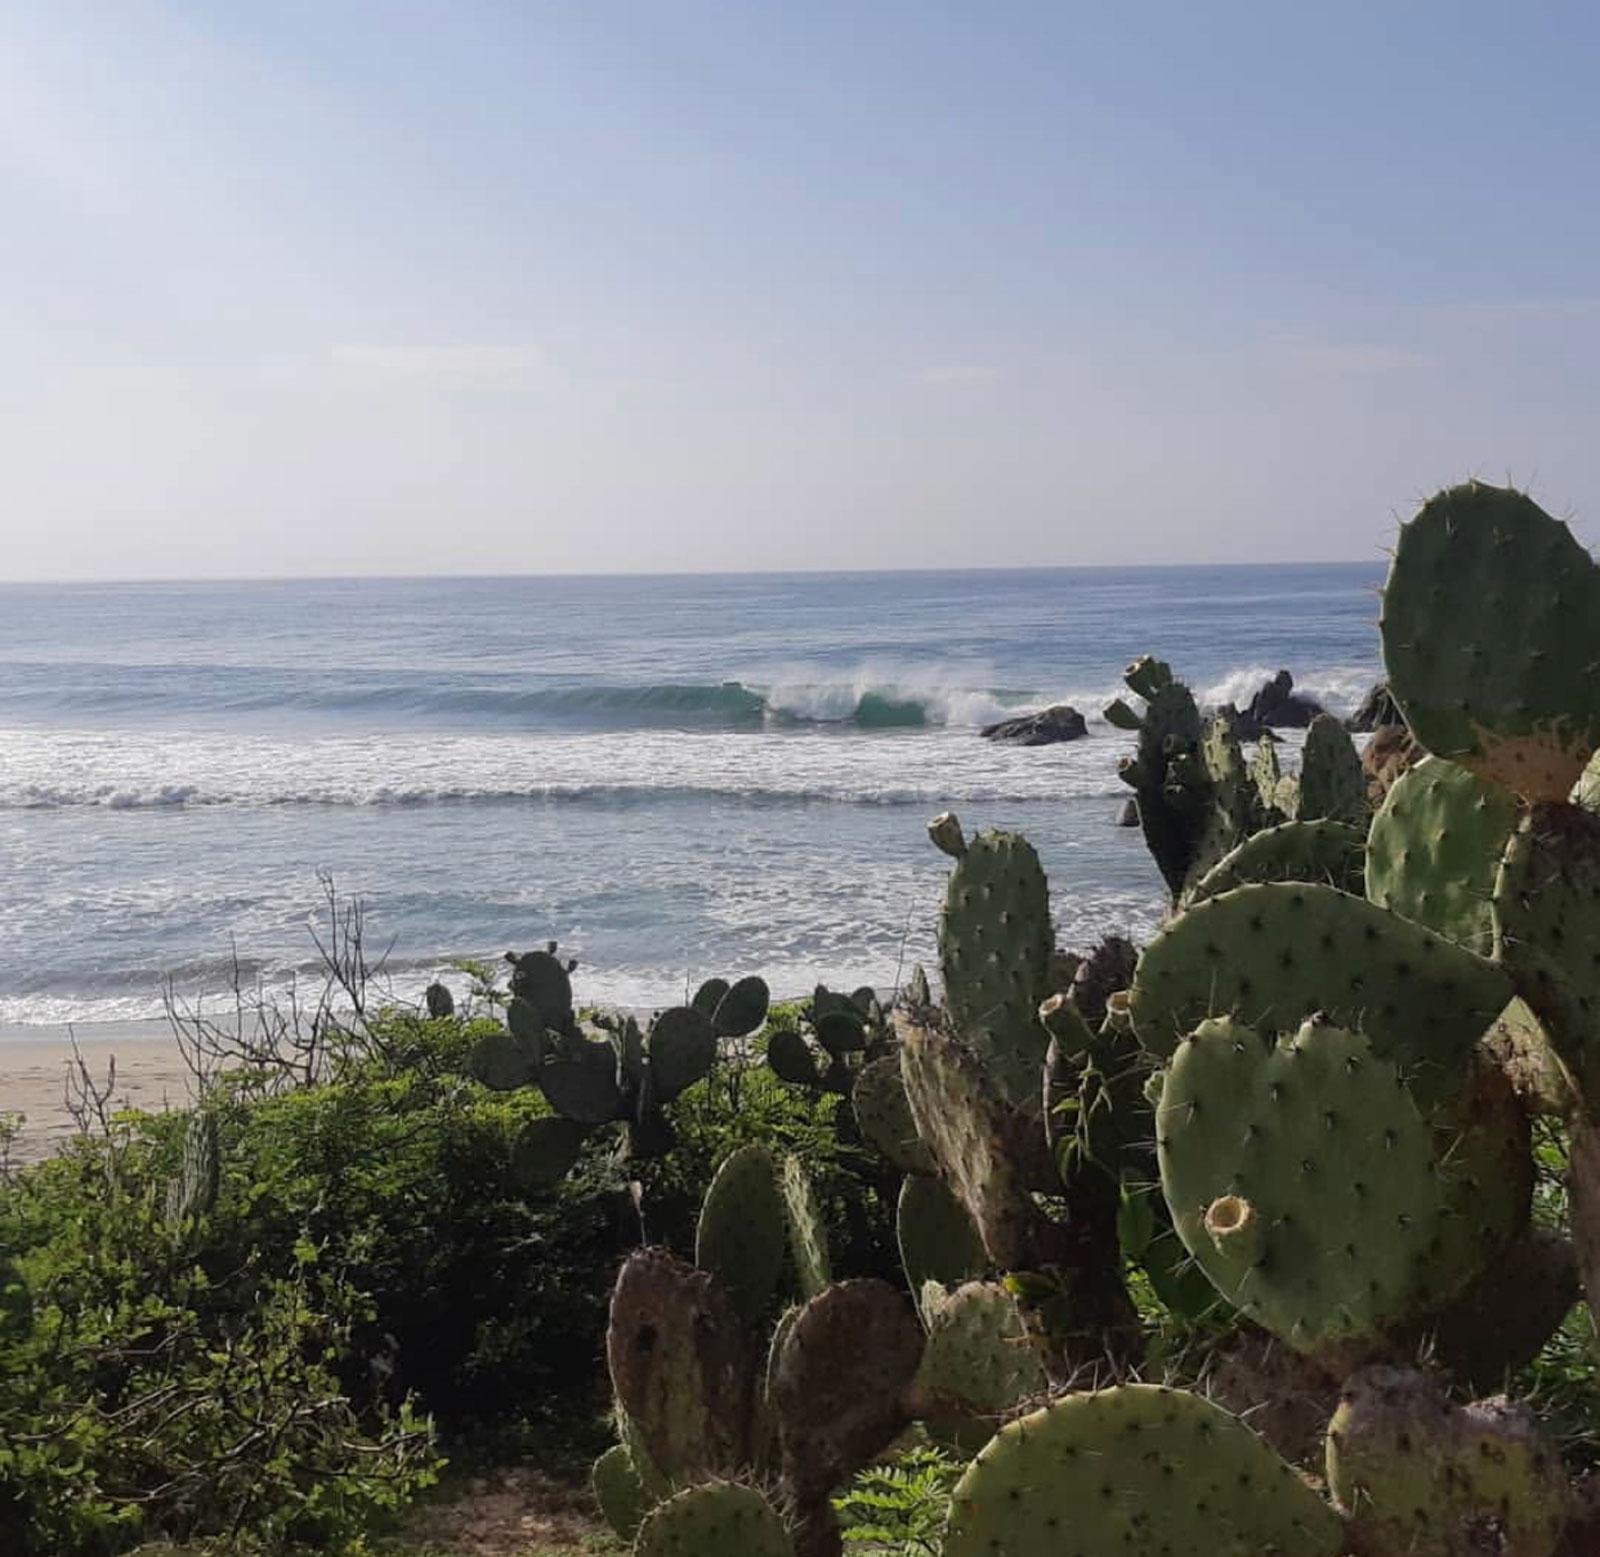 Punta Ramirez, Salina Cruz, Oaxaca, Mexico, Las Palmeras Surf Camp